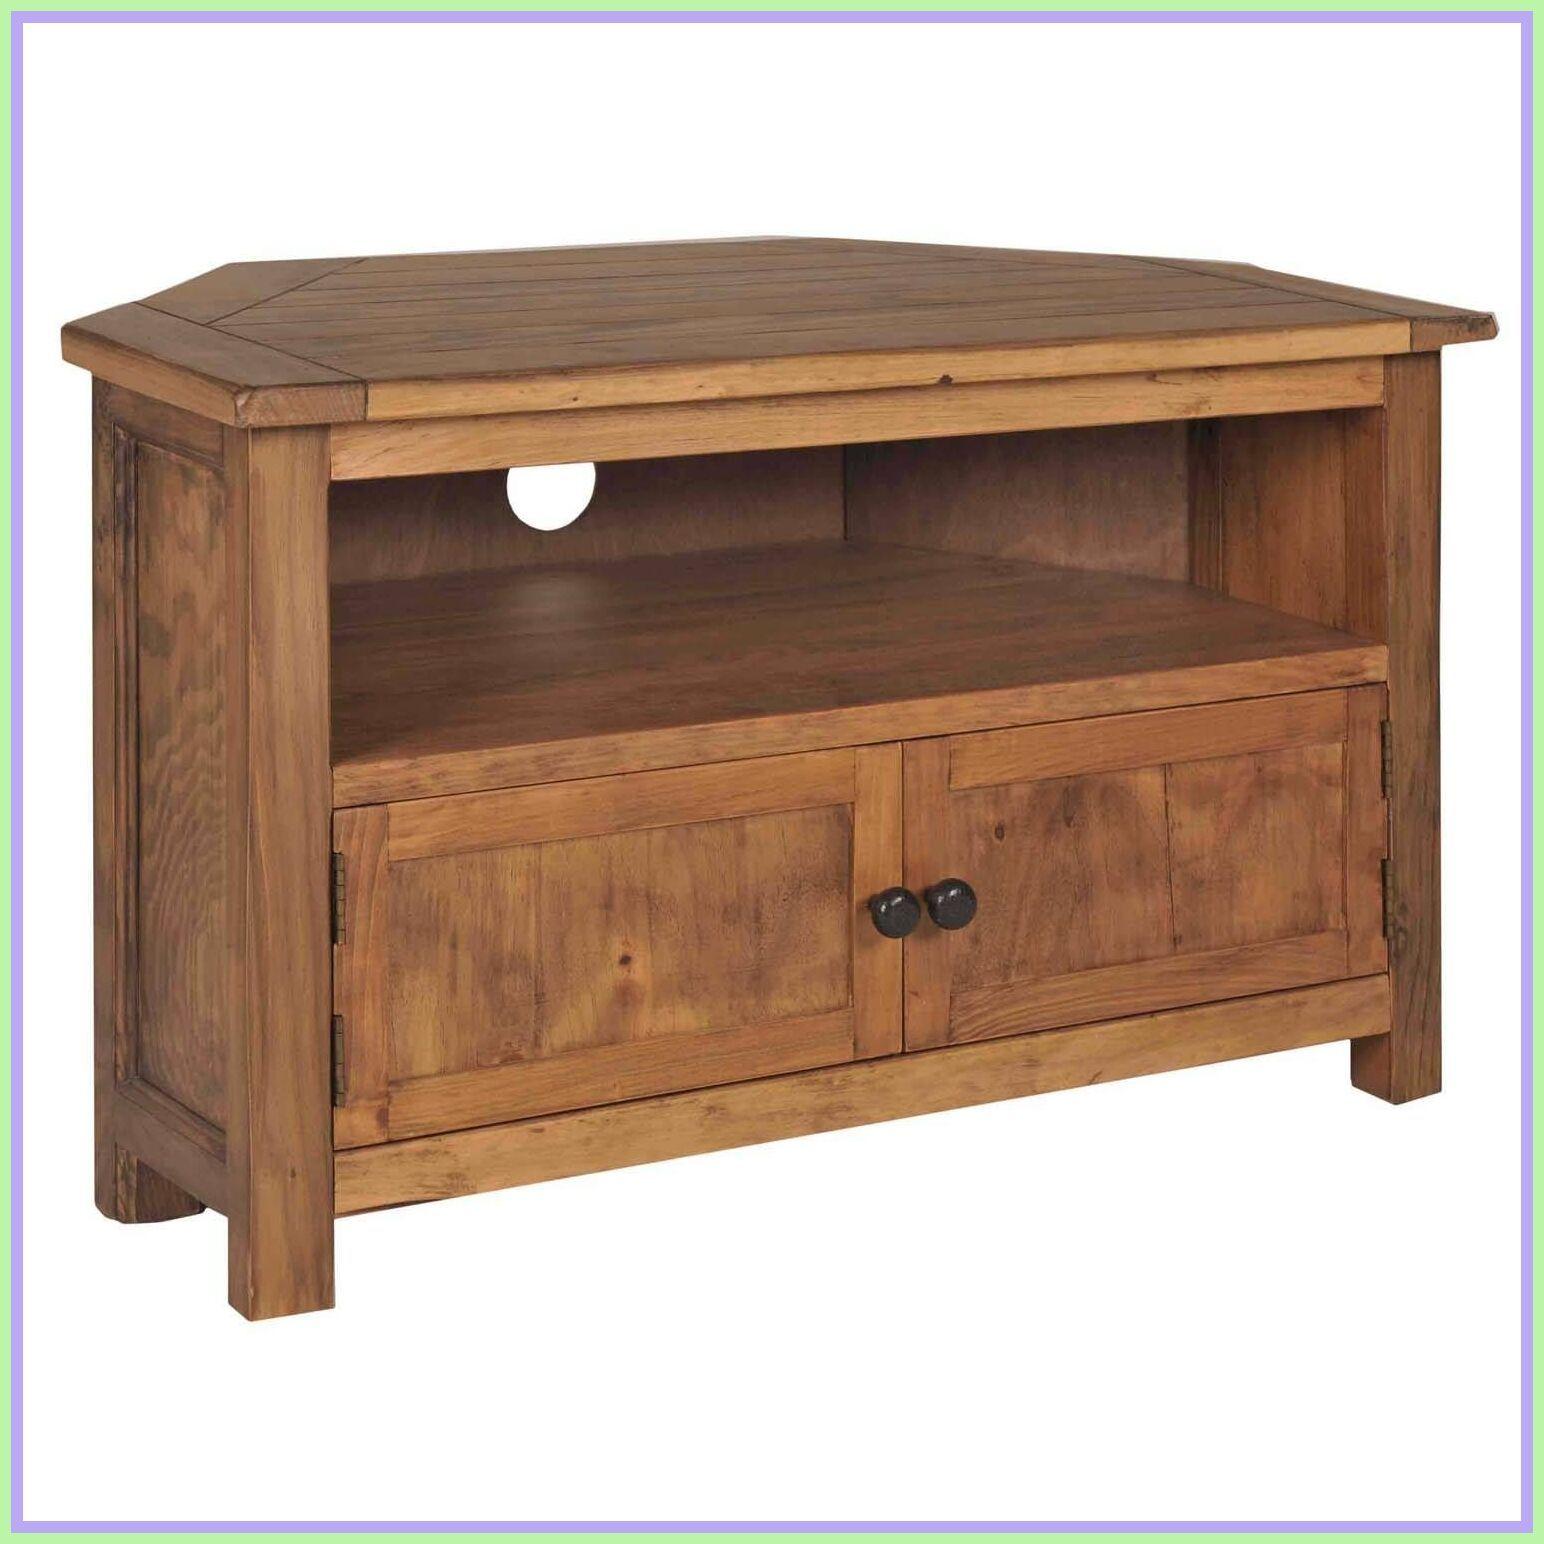 110 Reference Of Large Corner Tv Stand Oak Wood Corner Tv Stand Solid Wood Tv Stand Tv Stand Wood